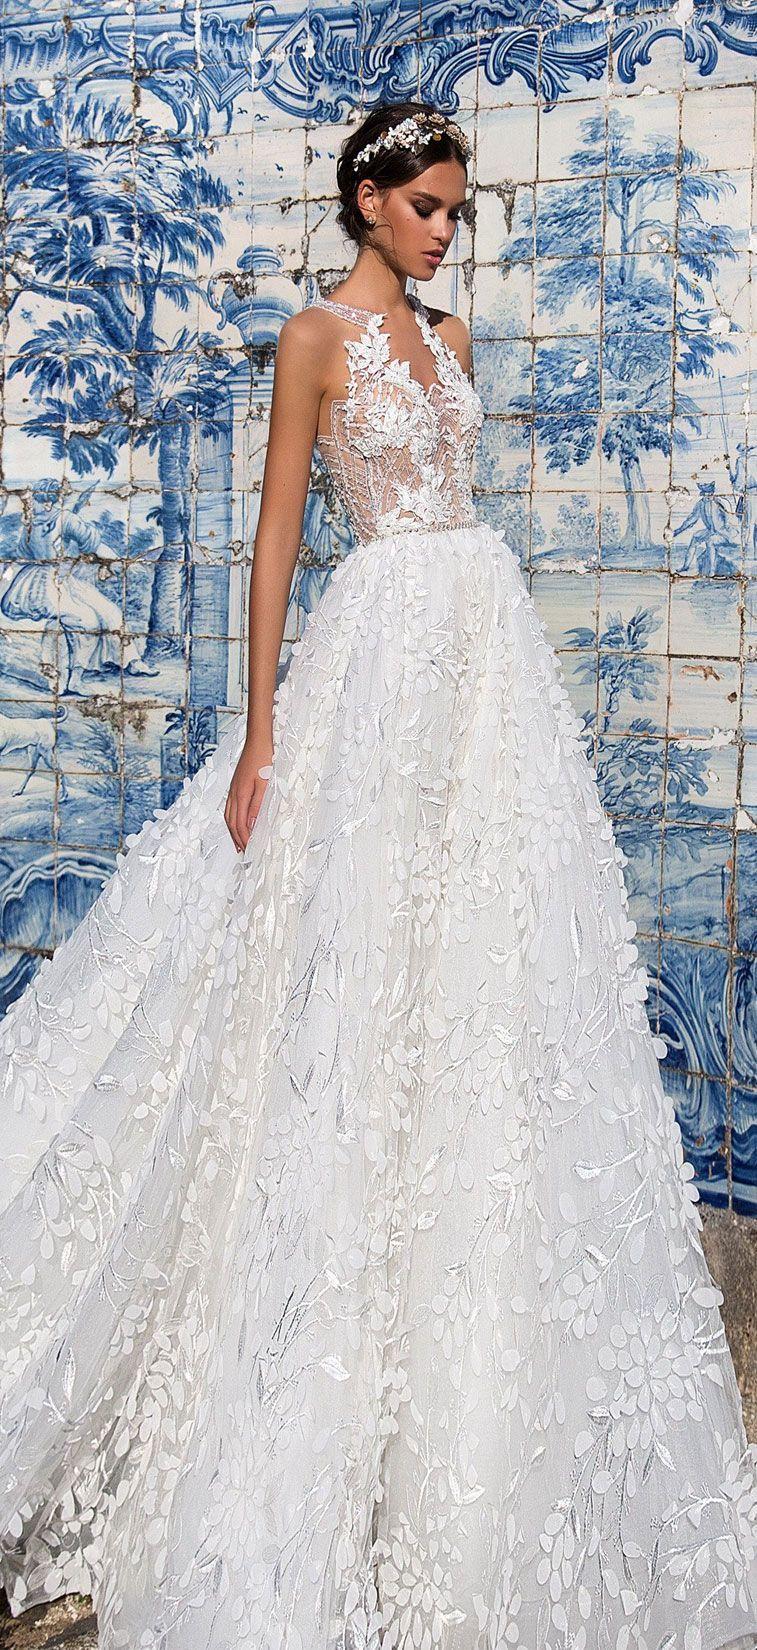 Milla nova wedding dress inspiration brides pinterest wedding